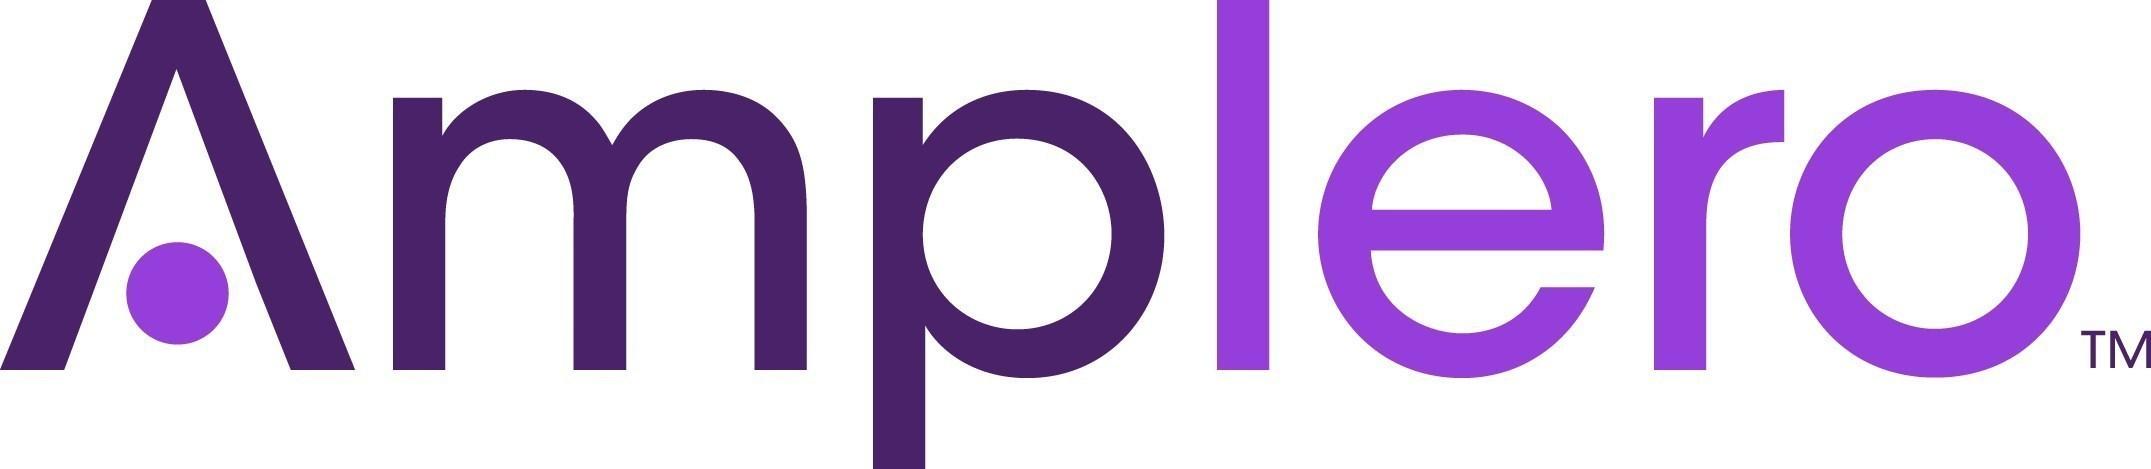 Amplero Logo (PRNewsFoto/Amplero) (PRNewsfoto/Amplero)